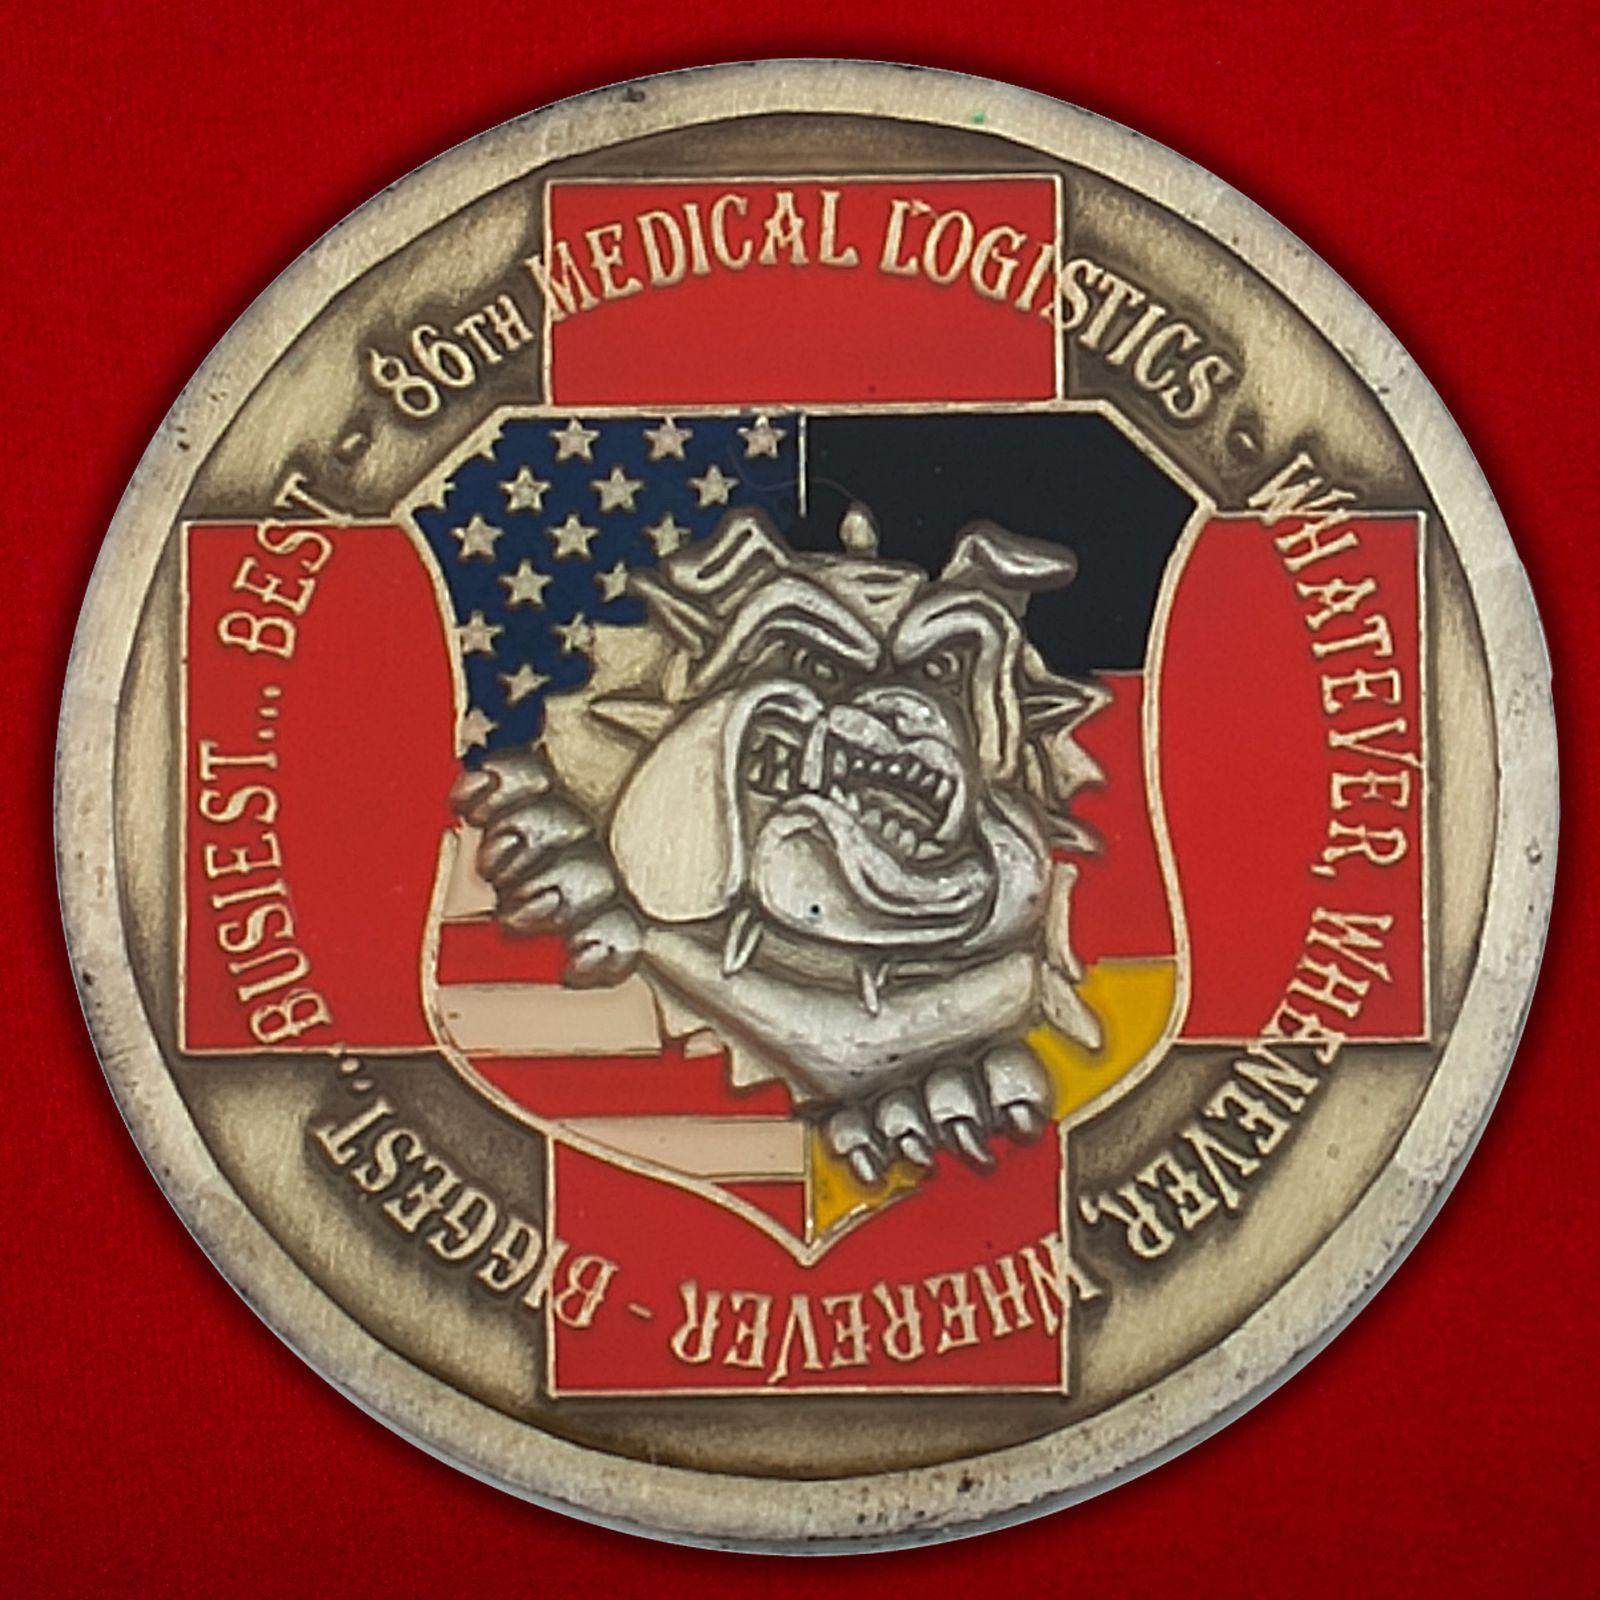 Челлендж коин службы снабжения 86-й Медицинской группы, авиабаза Рамштайн, ФРГ